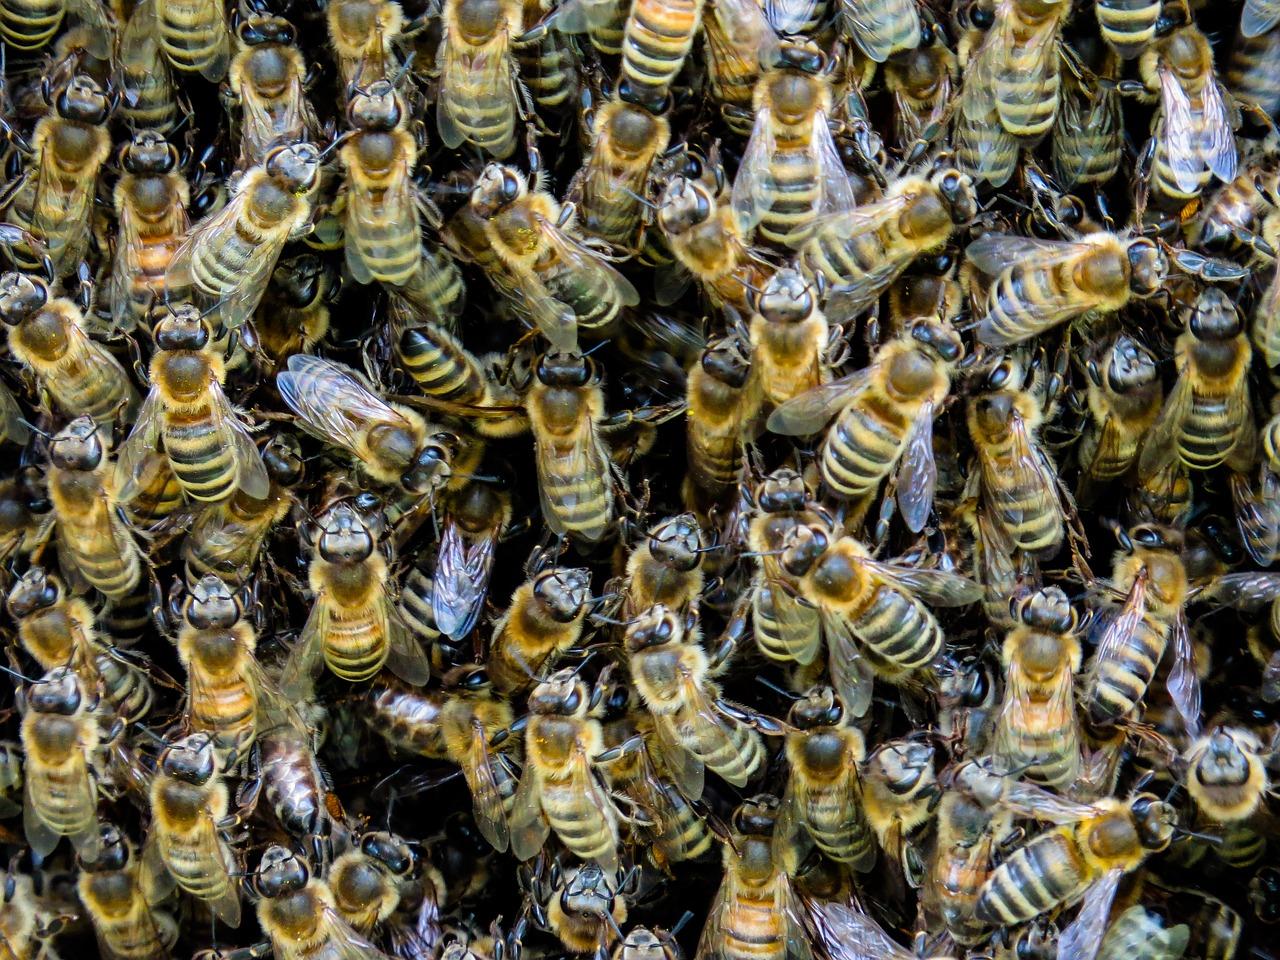 bees pixabay_1554776139910.jpg.jpg